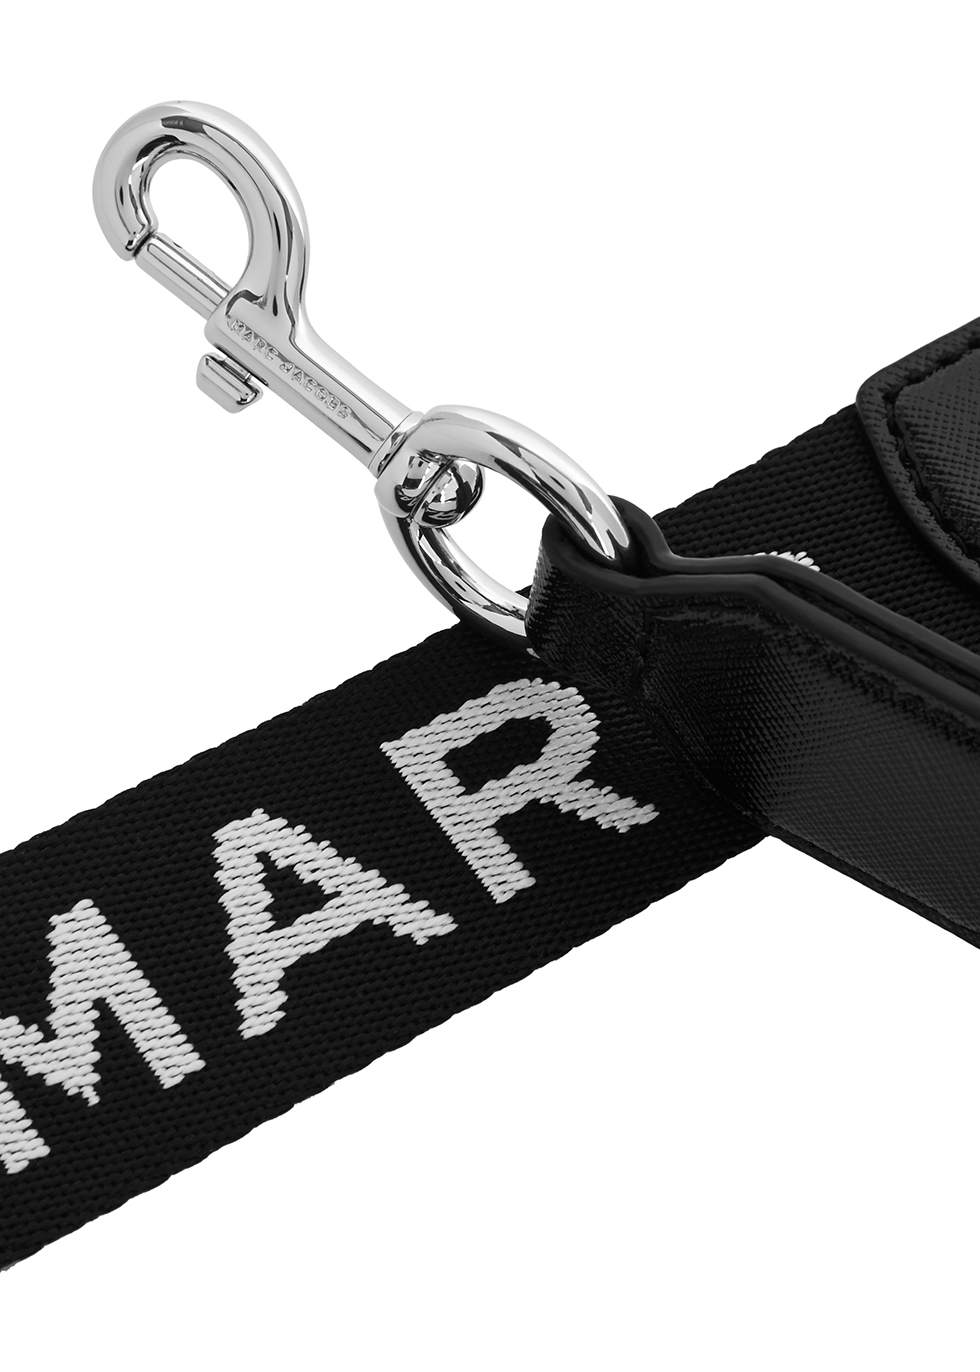 Logo-jacquard webbing bag strap - Marc Jacobs